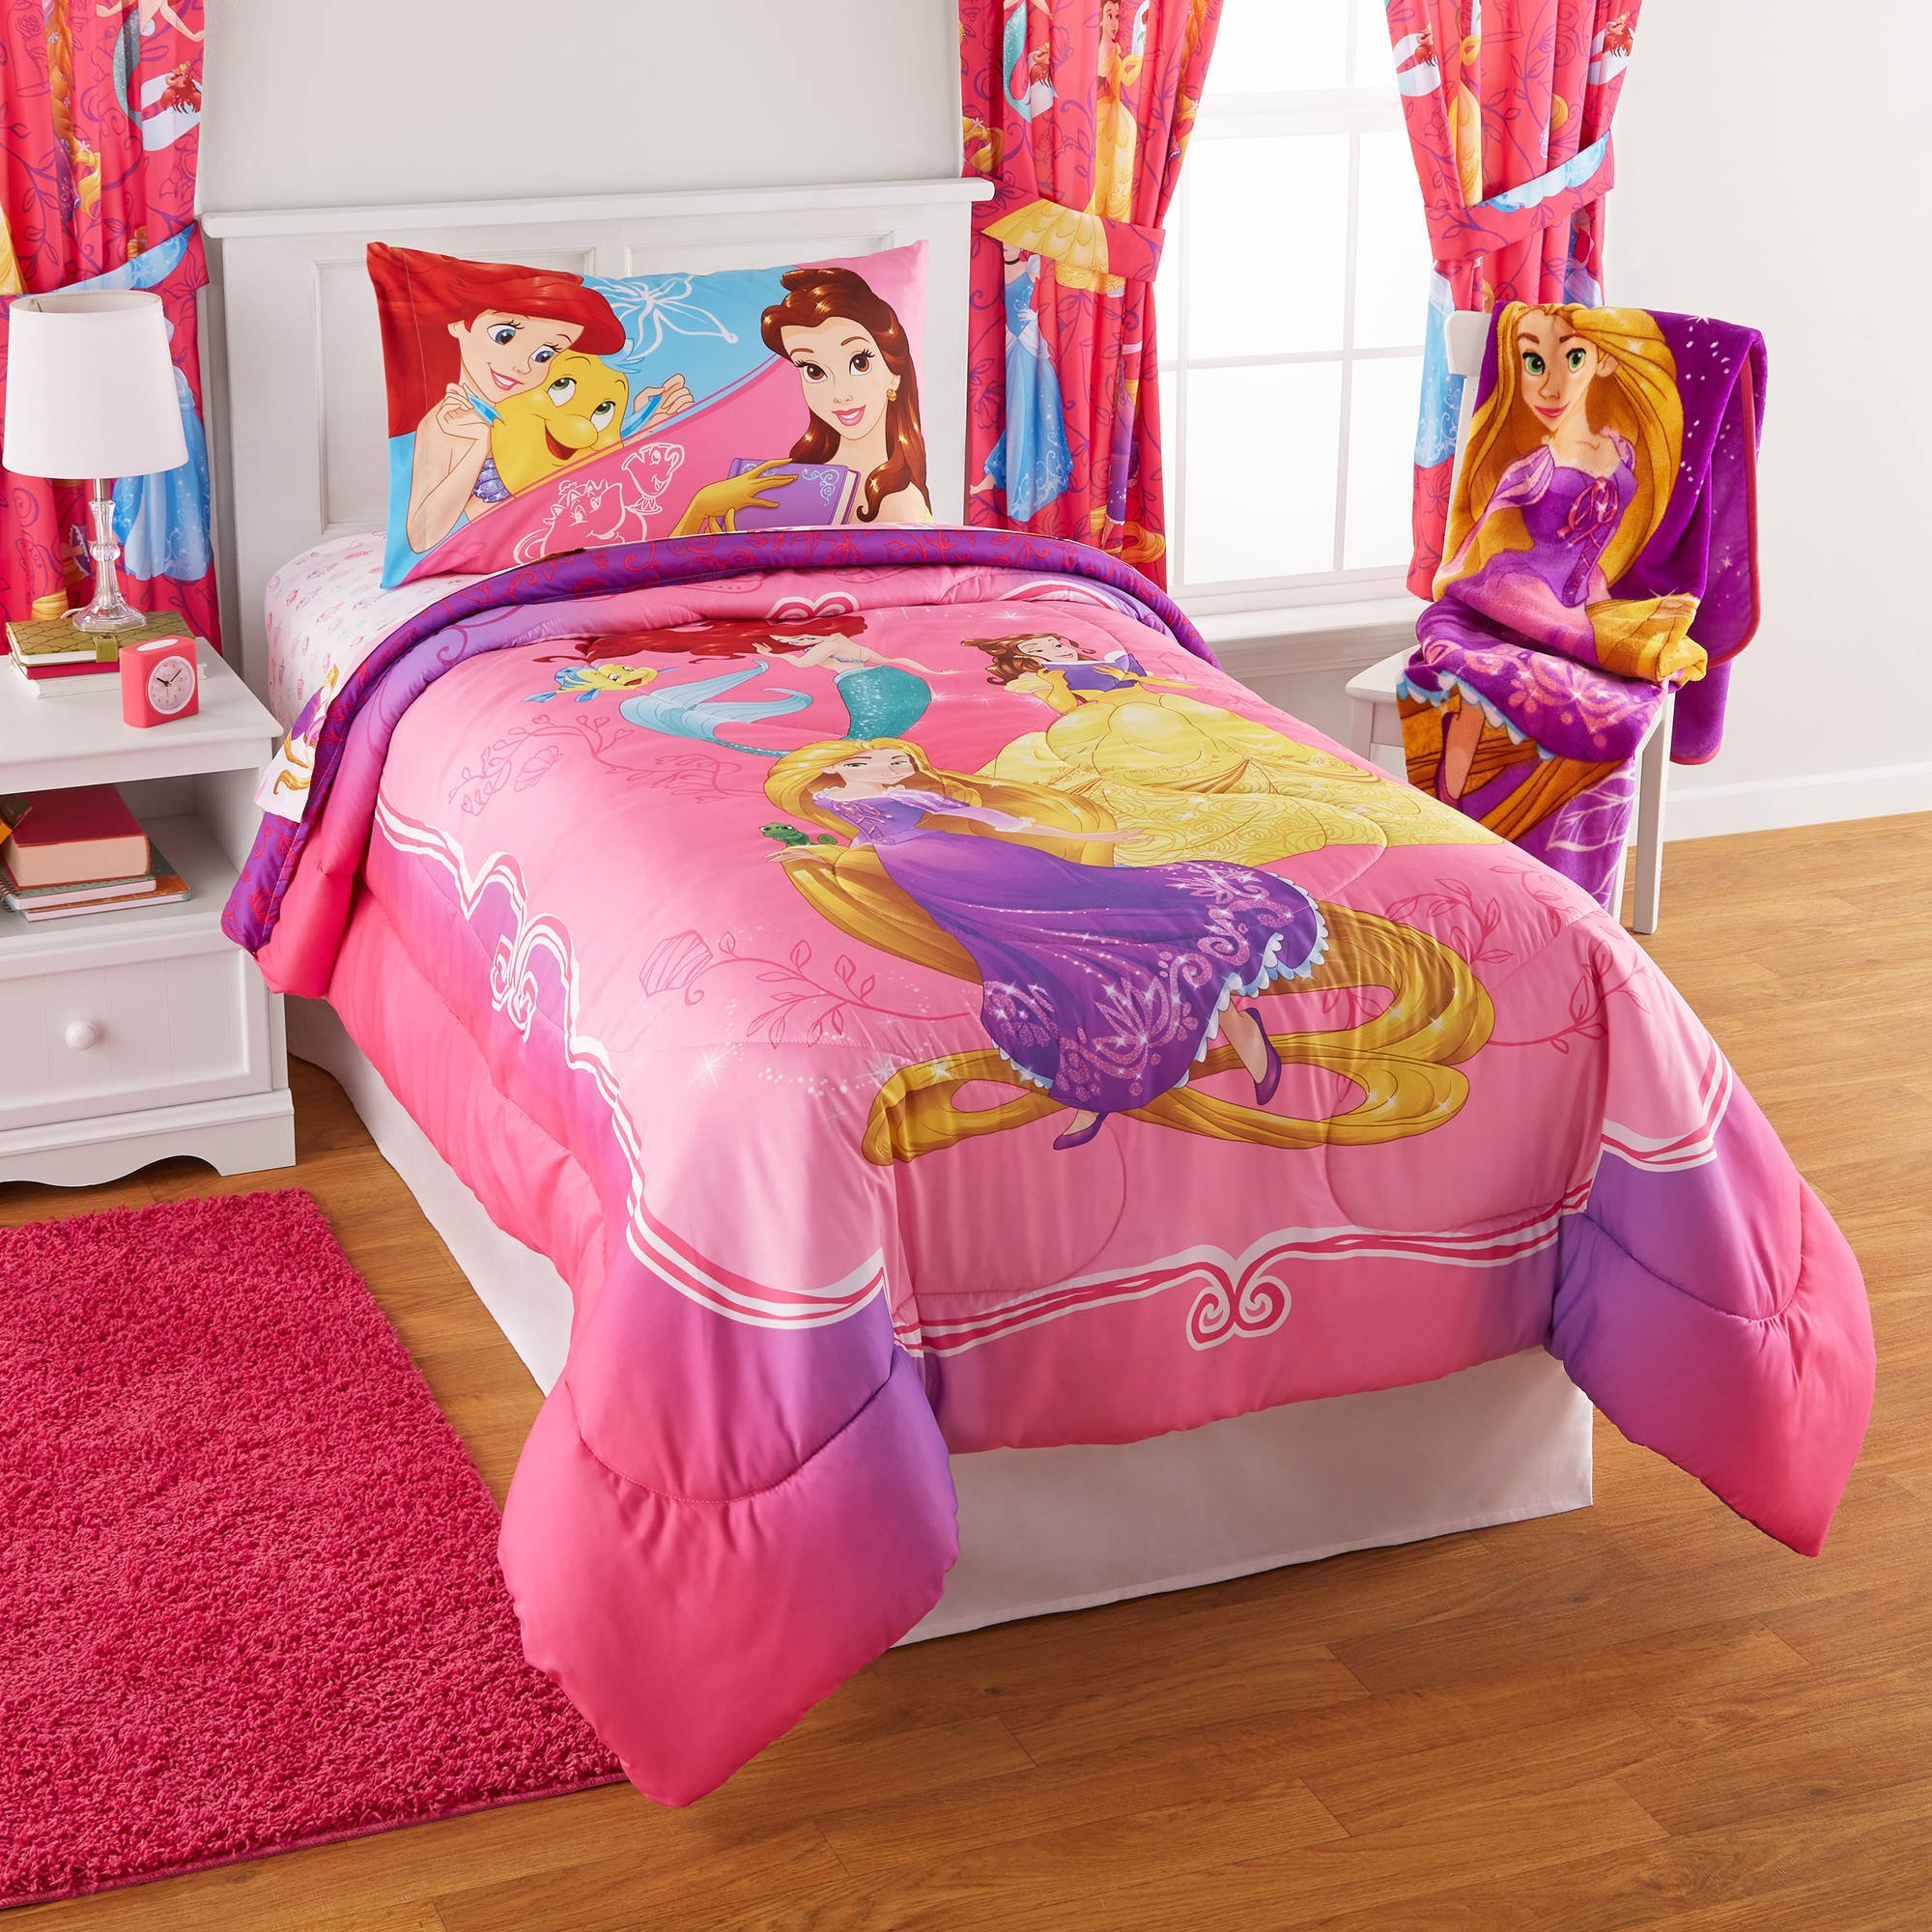 Disney Princess Bedazzling Princess Reversible Twin/Full Bedding Comforter and Full Sheet Set